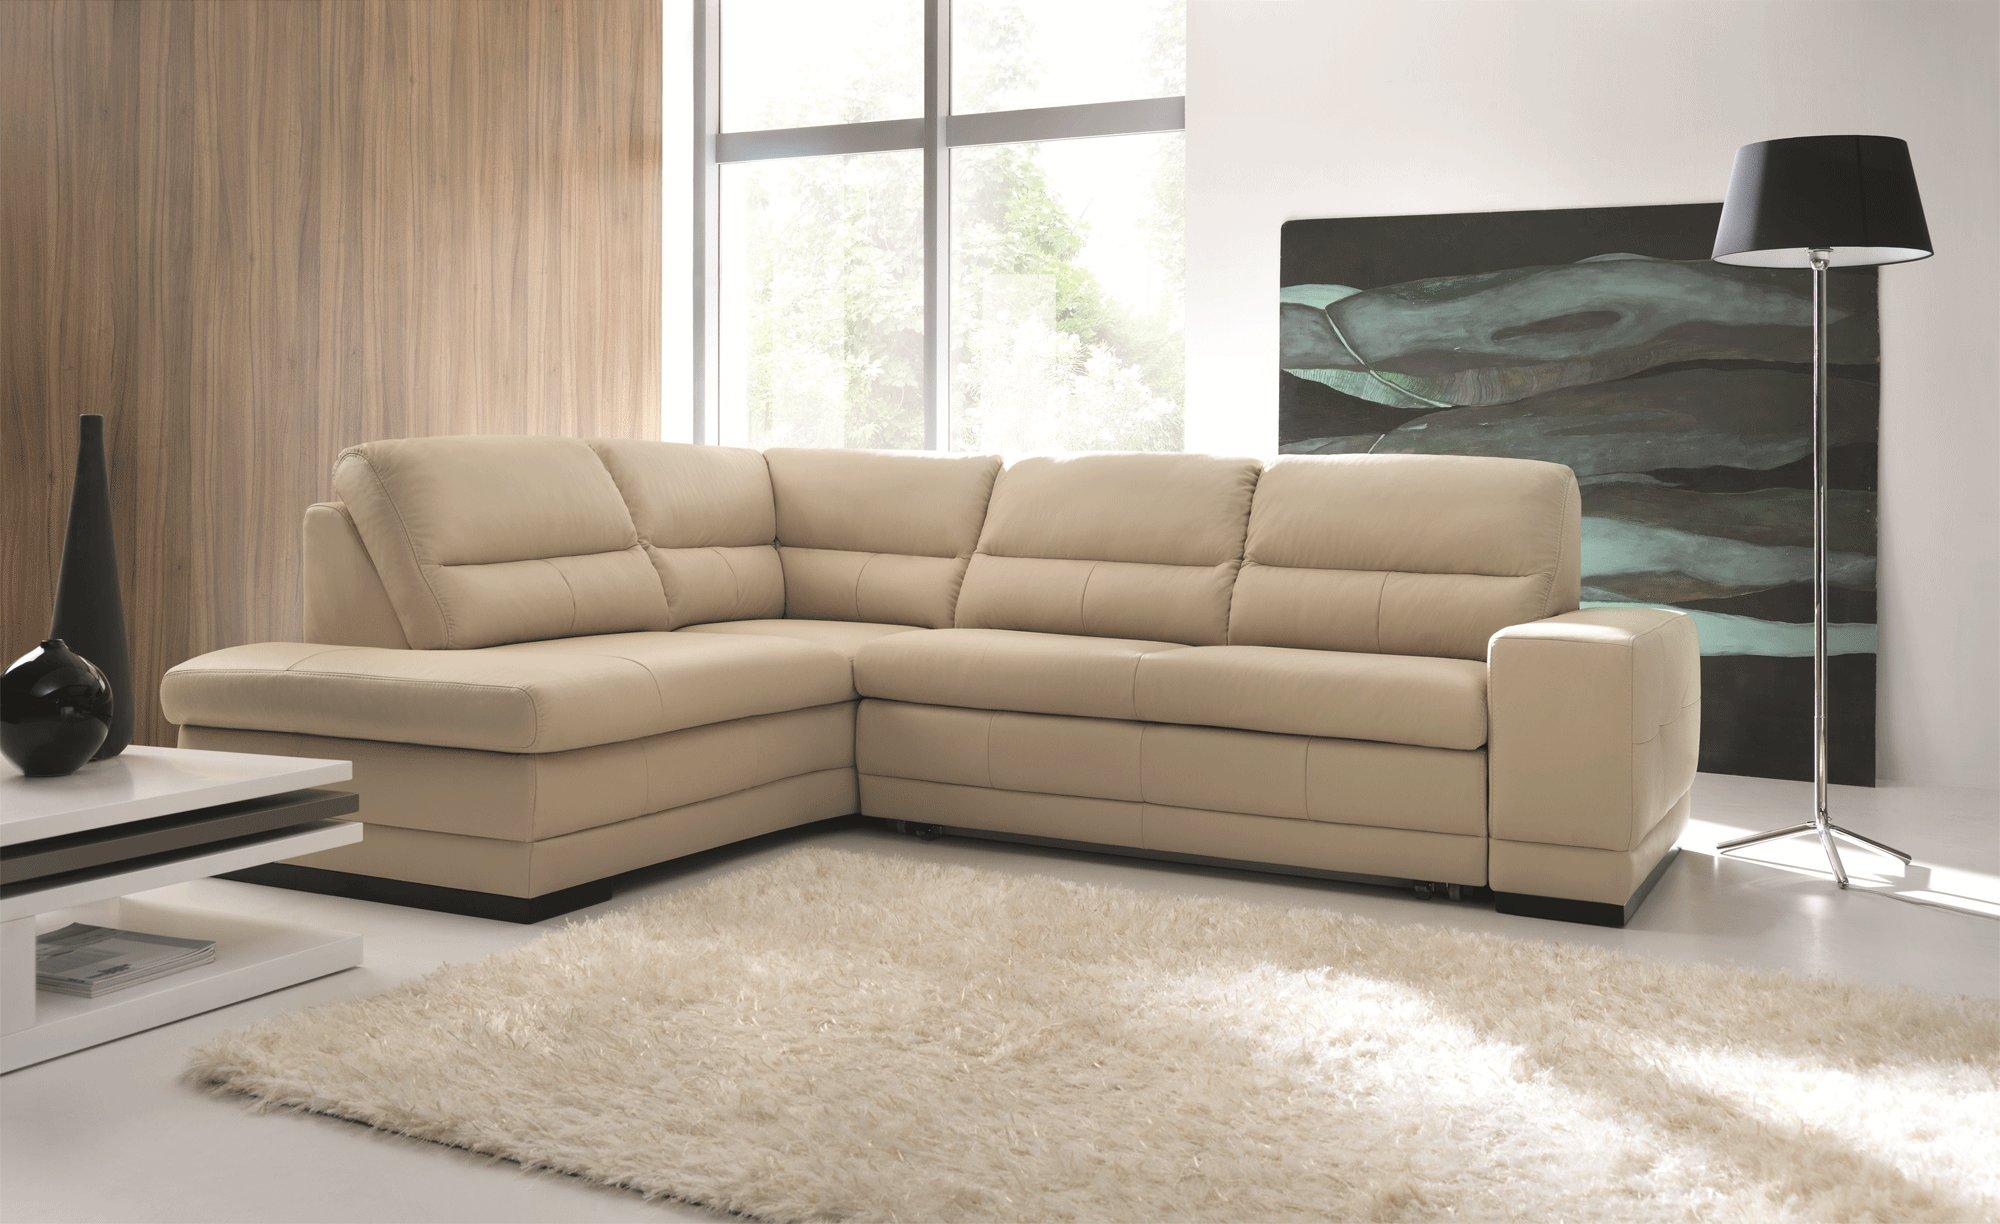 Luxurious Italian Leather Living Room Furniture Baton